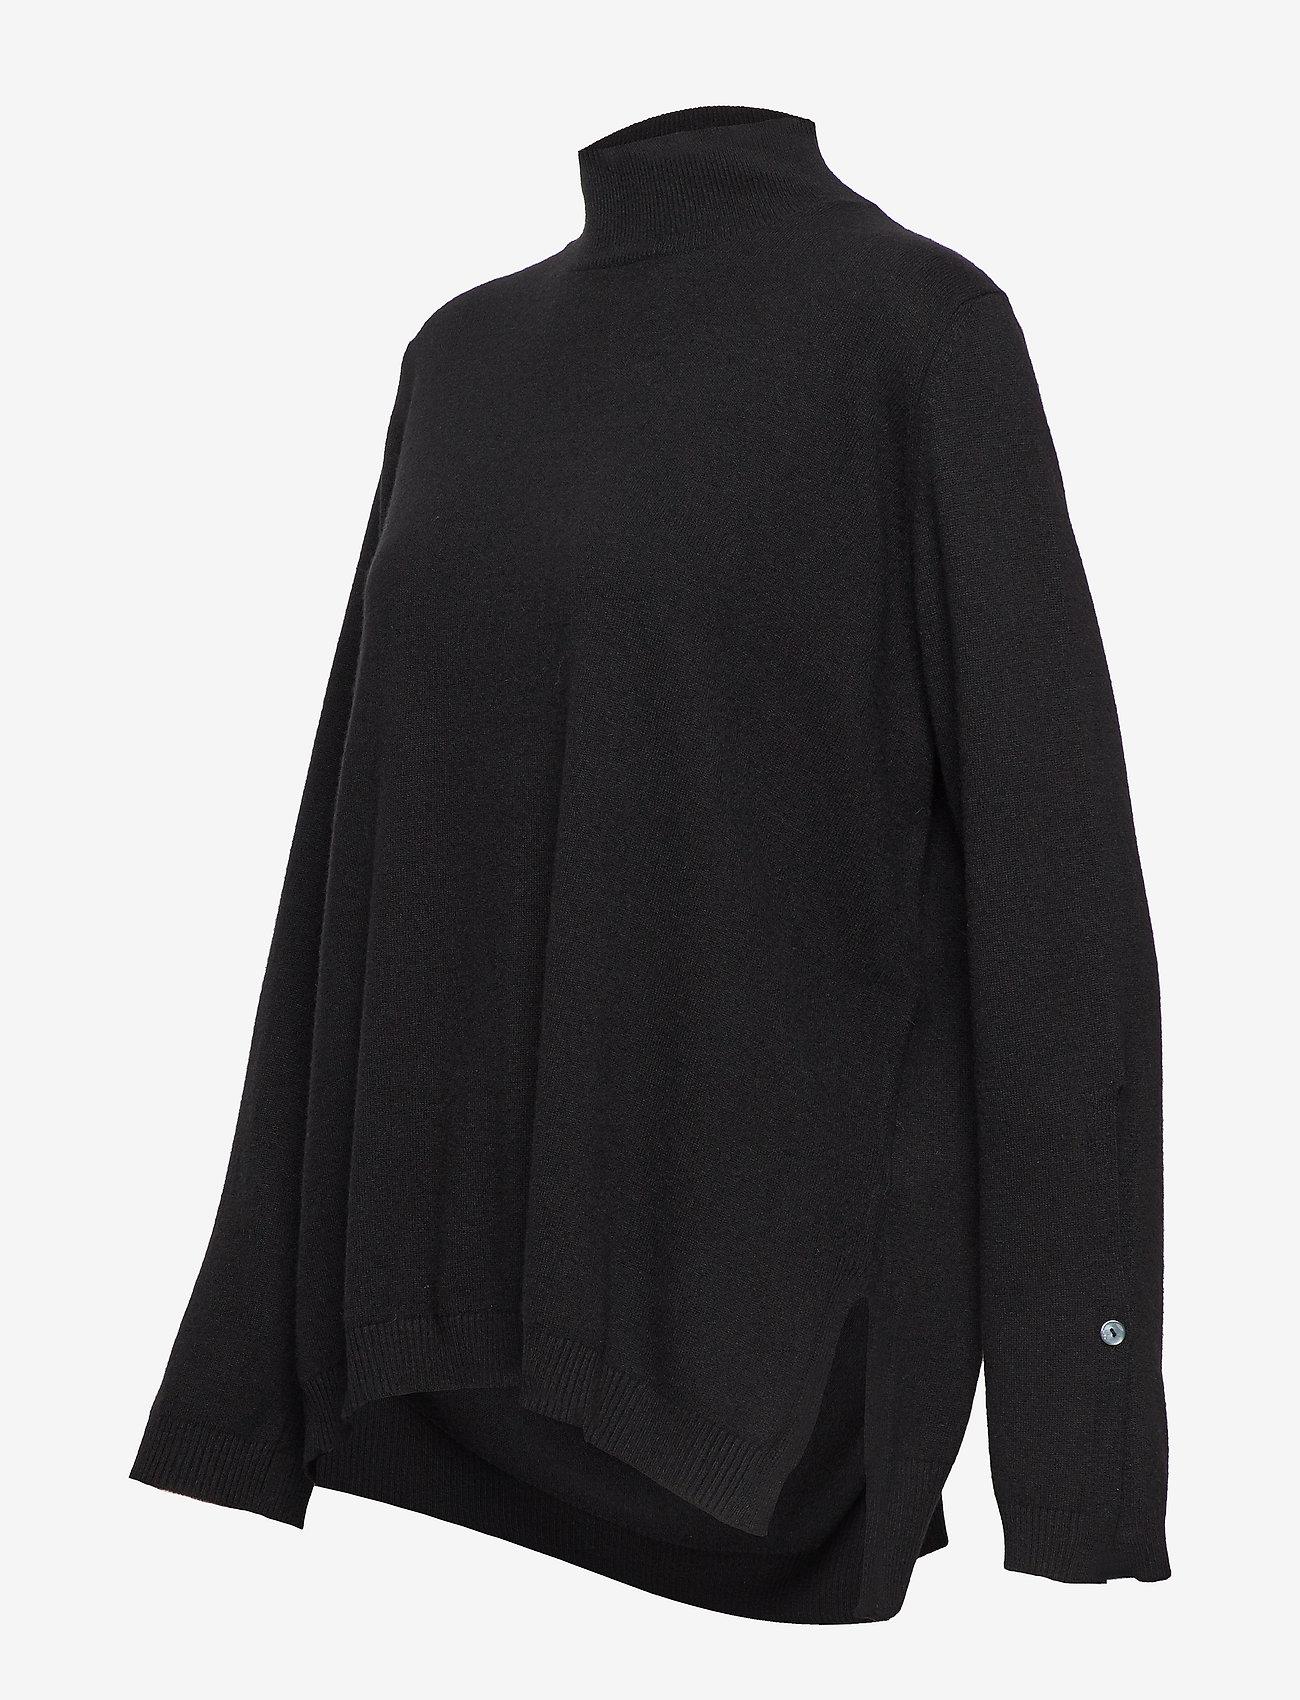 Rio Sweater (Black) (99 €) - Hope mhSUO